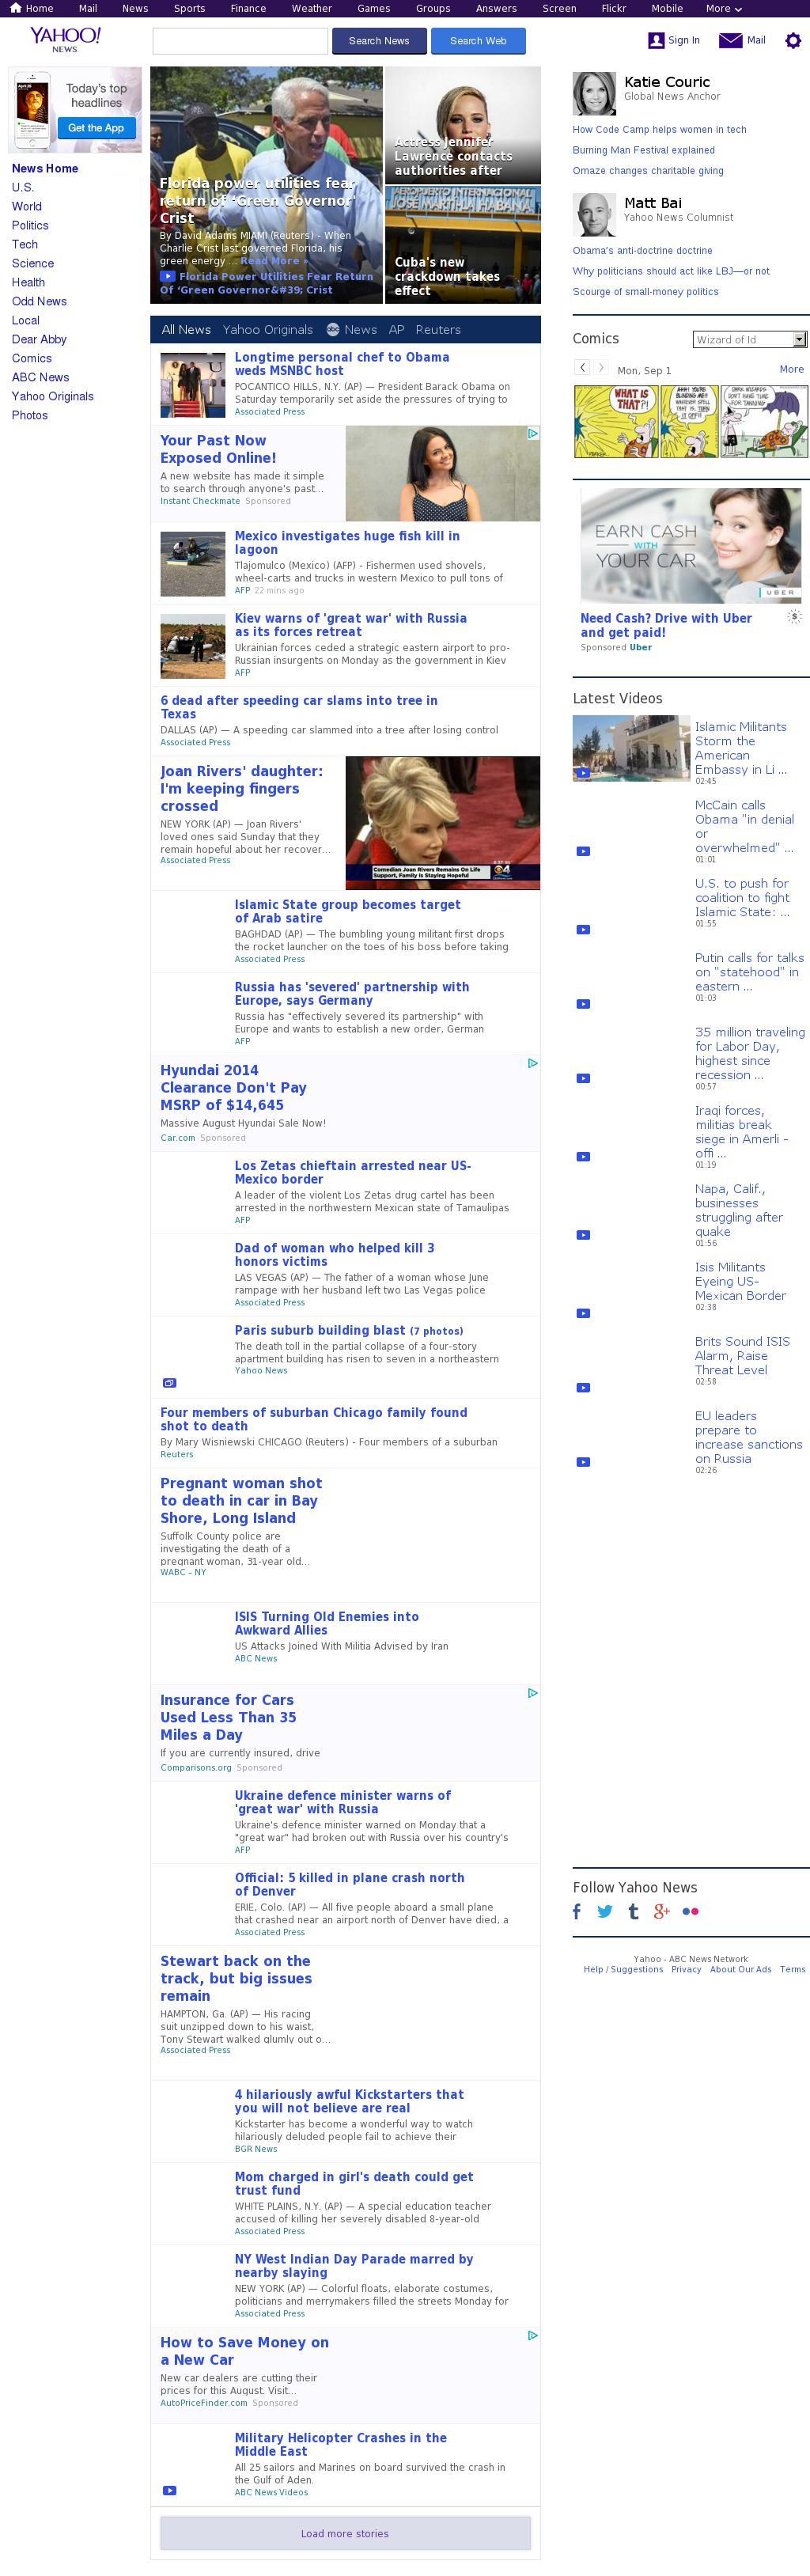 Yahoo! News at Tuesday Sept. 2, 2014, 1:24 a.m. UTC